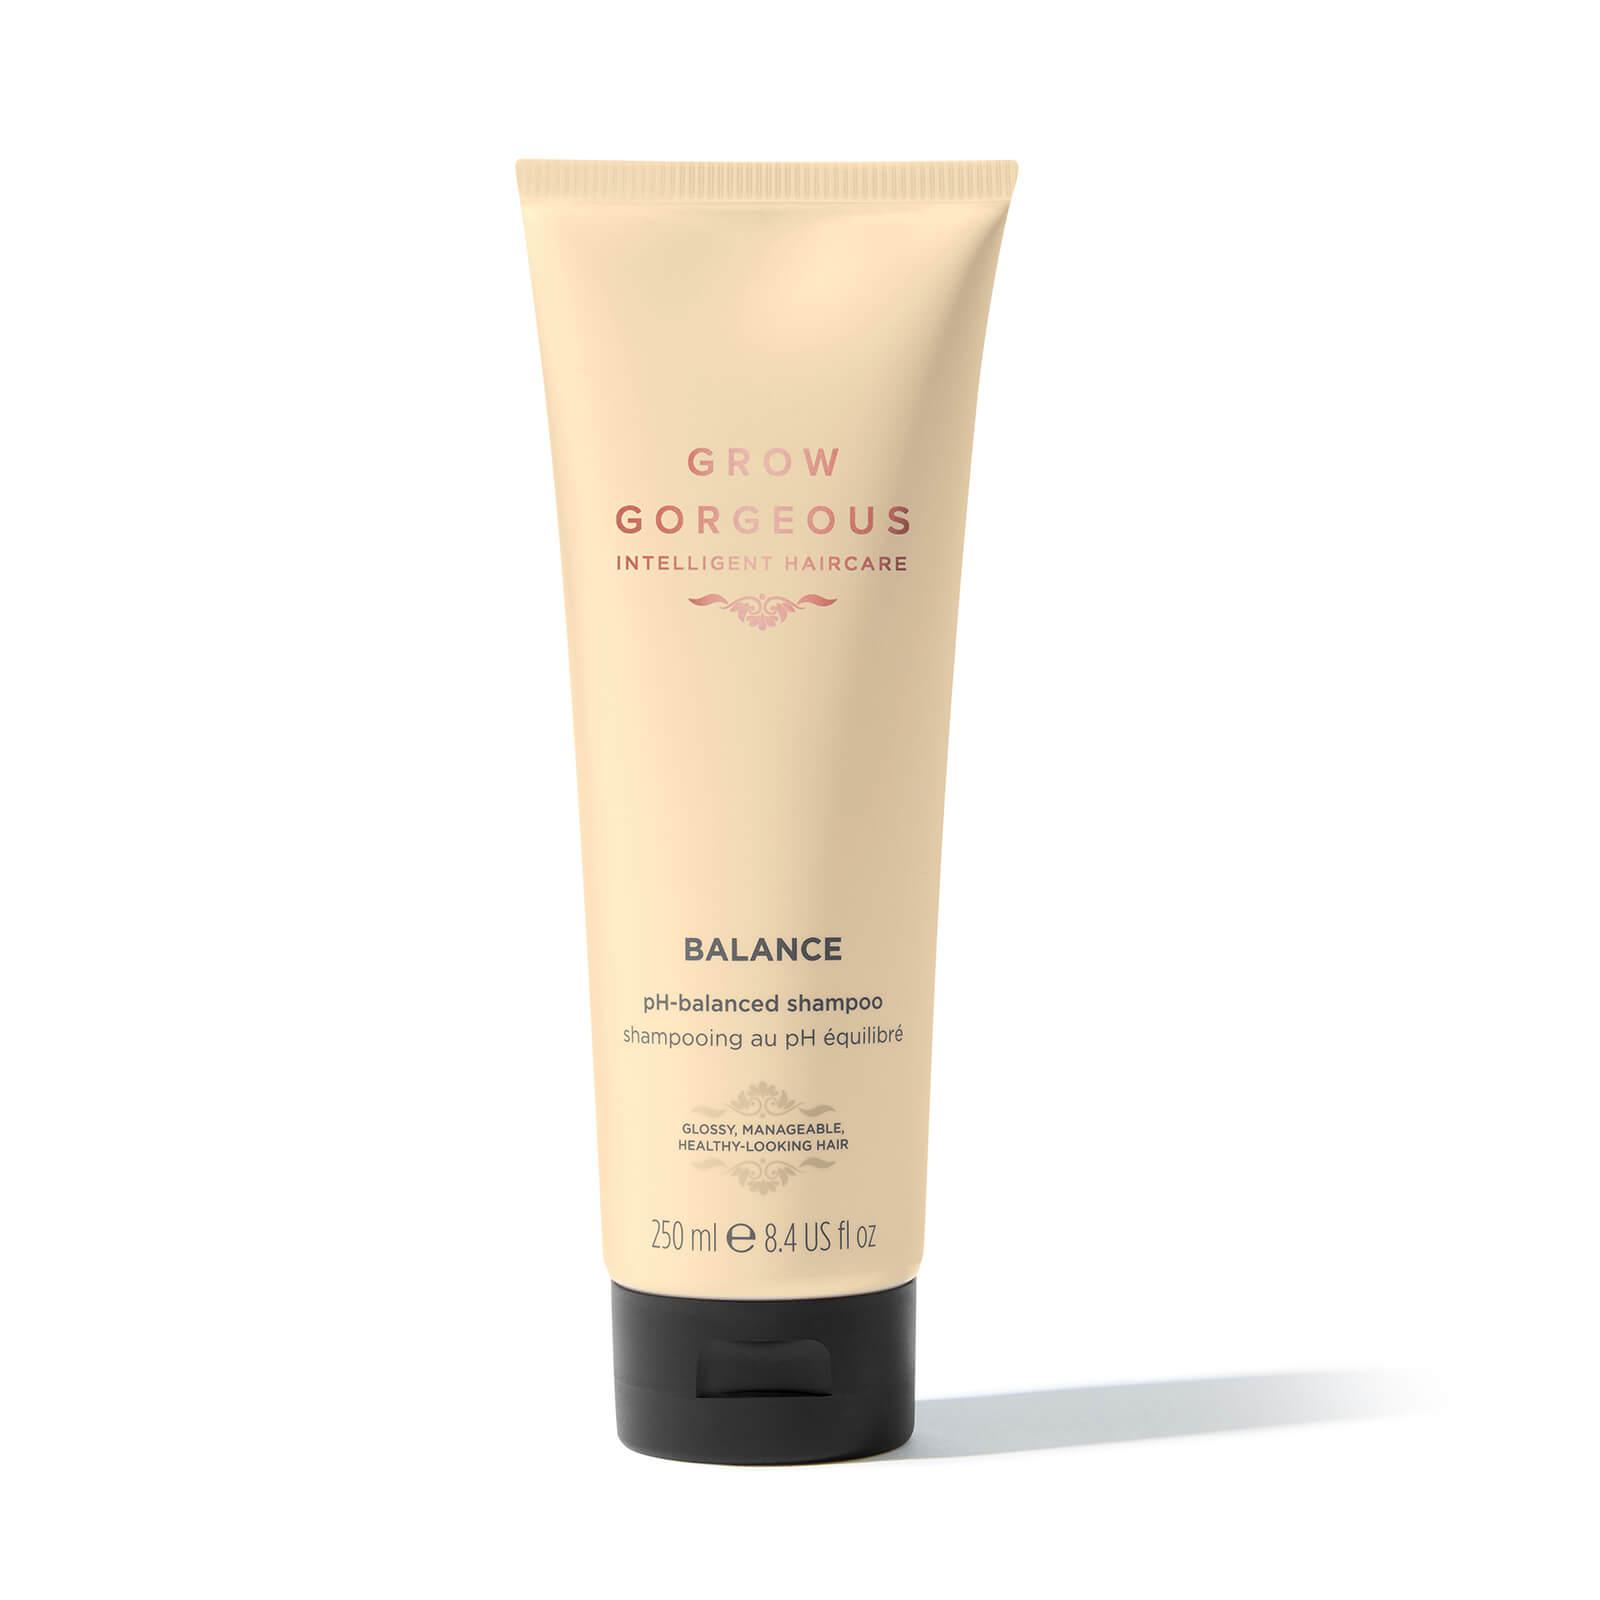 Grow Gorgeous Shampooing au pH Neutre Balance 250ml